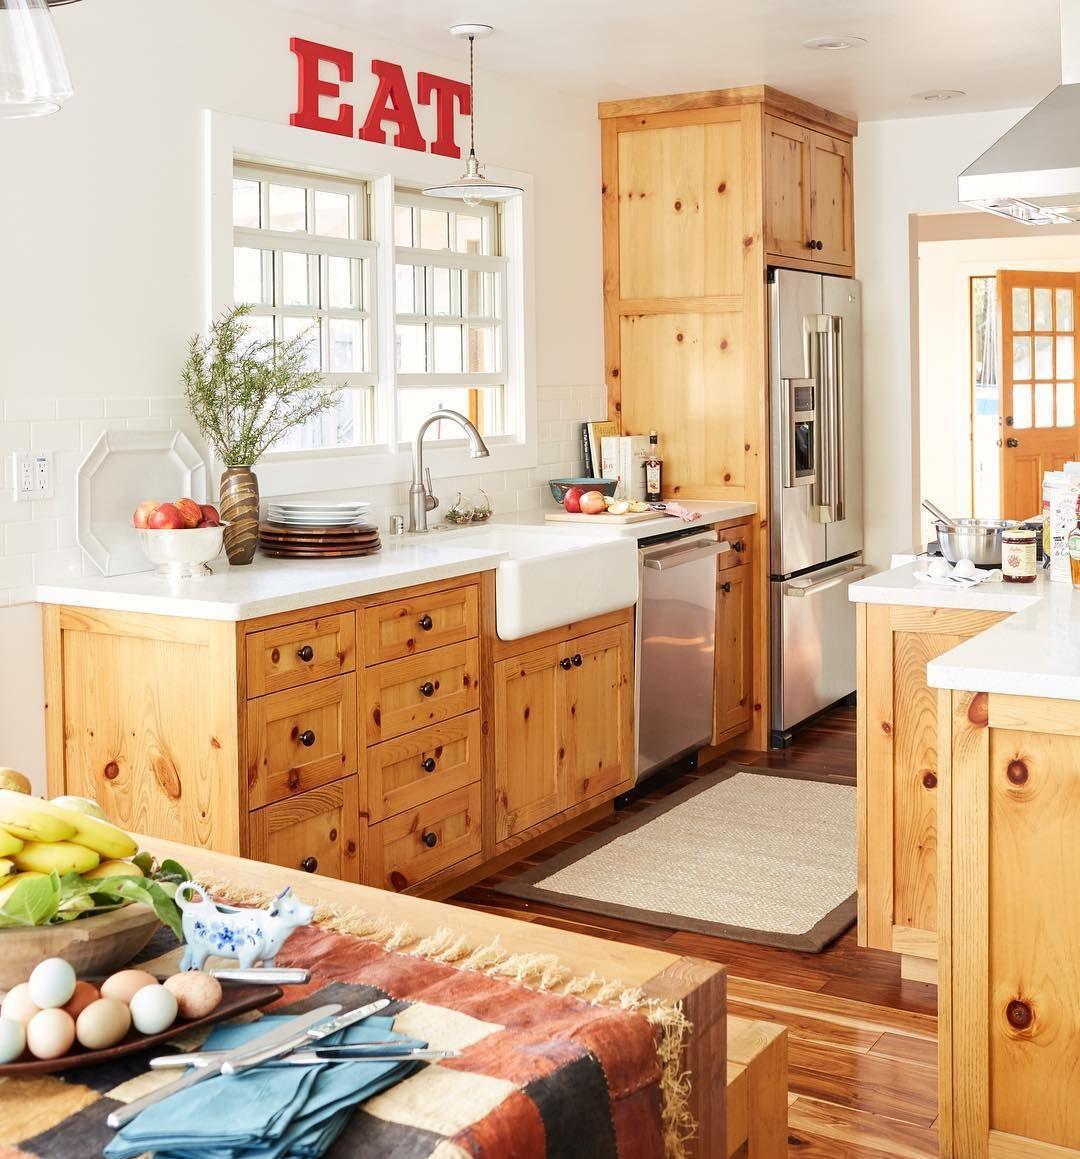 Lowe S Knotty Pine Cabinets: @elizabethmorganalbert Chose Knotty Pine Cabinets, Despite